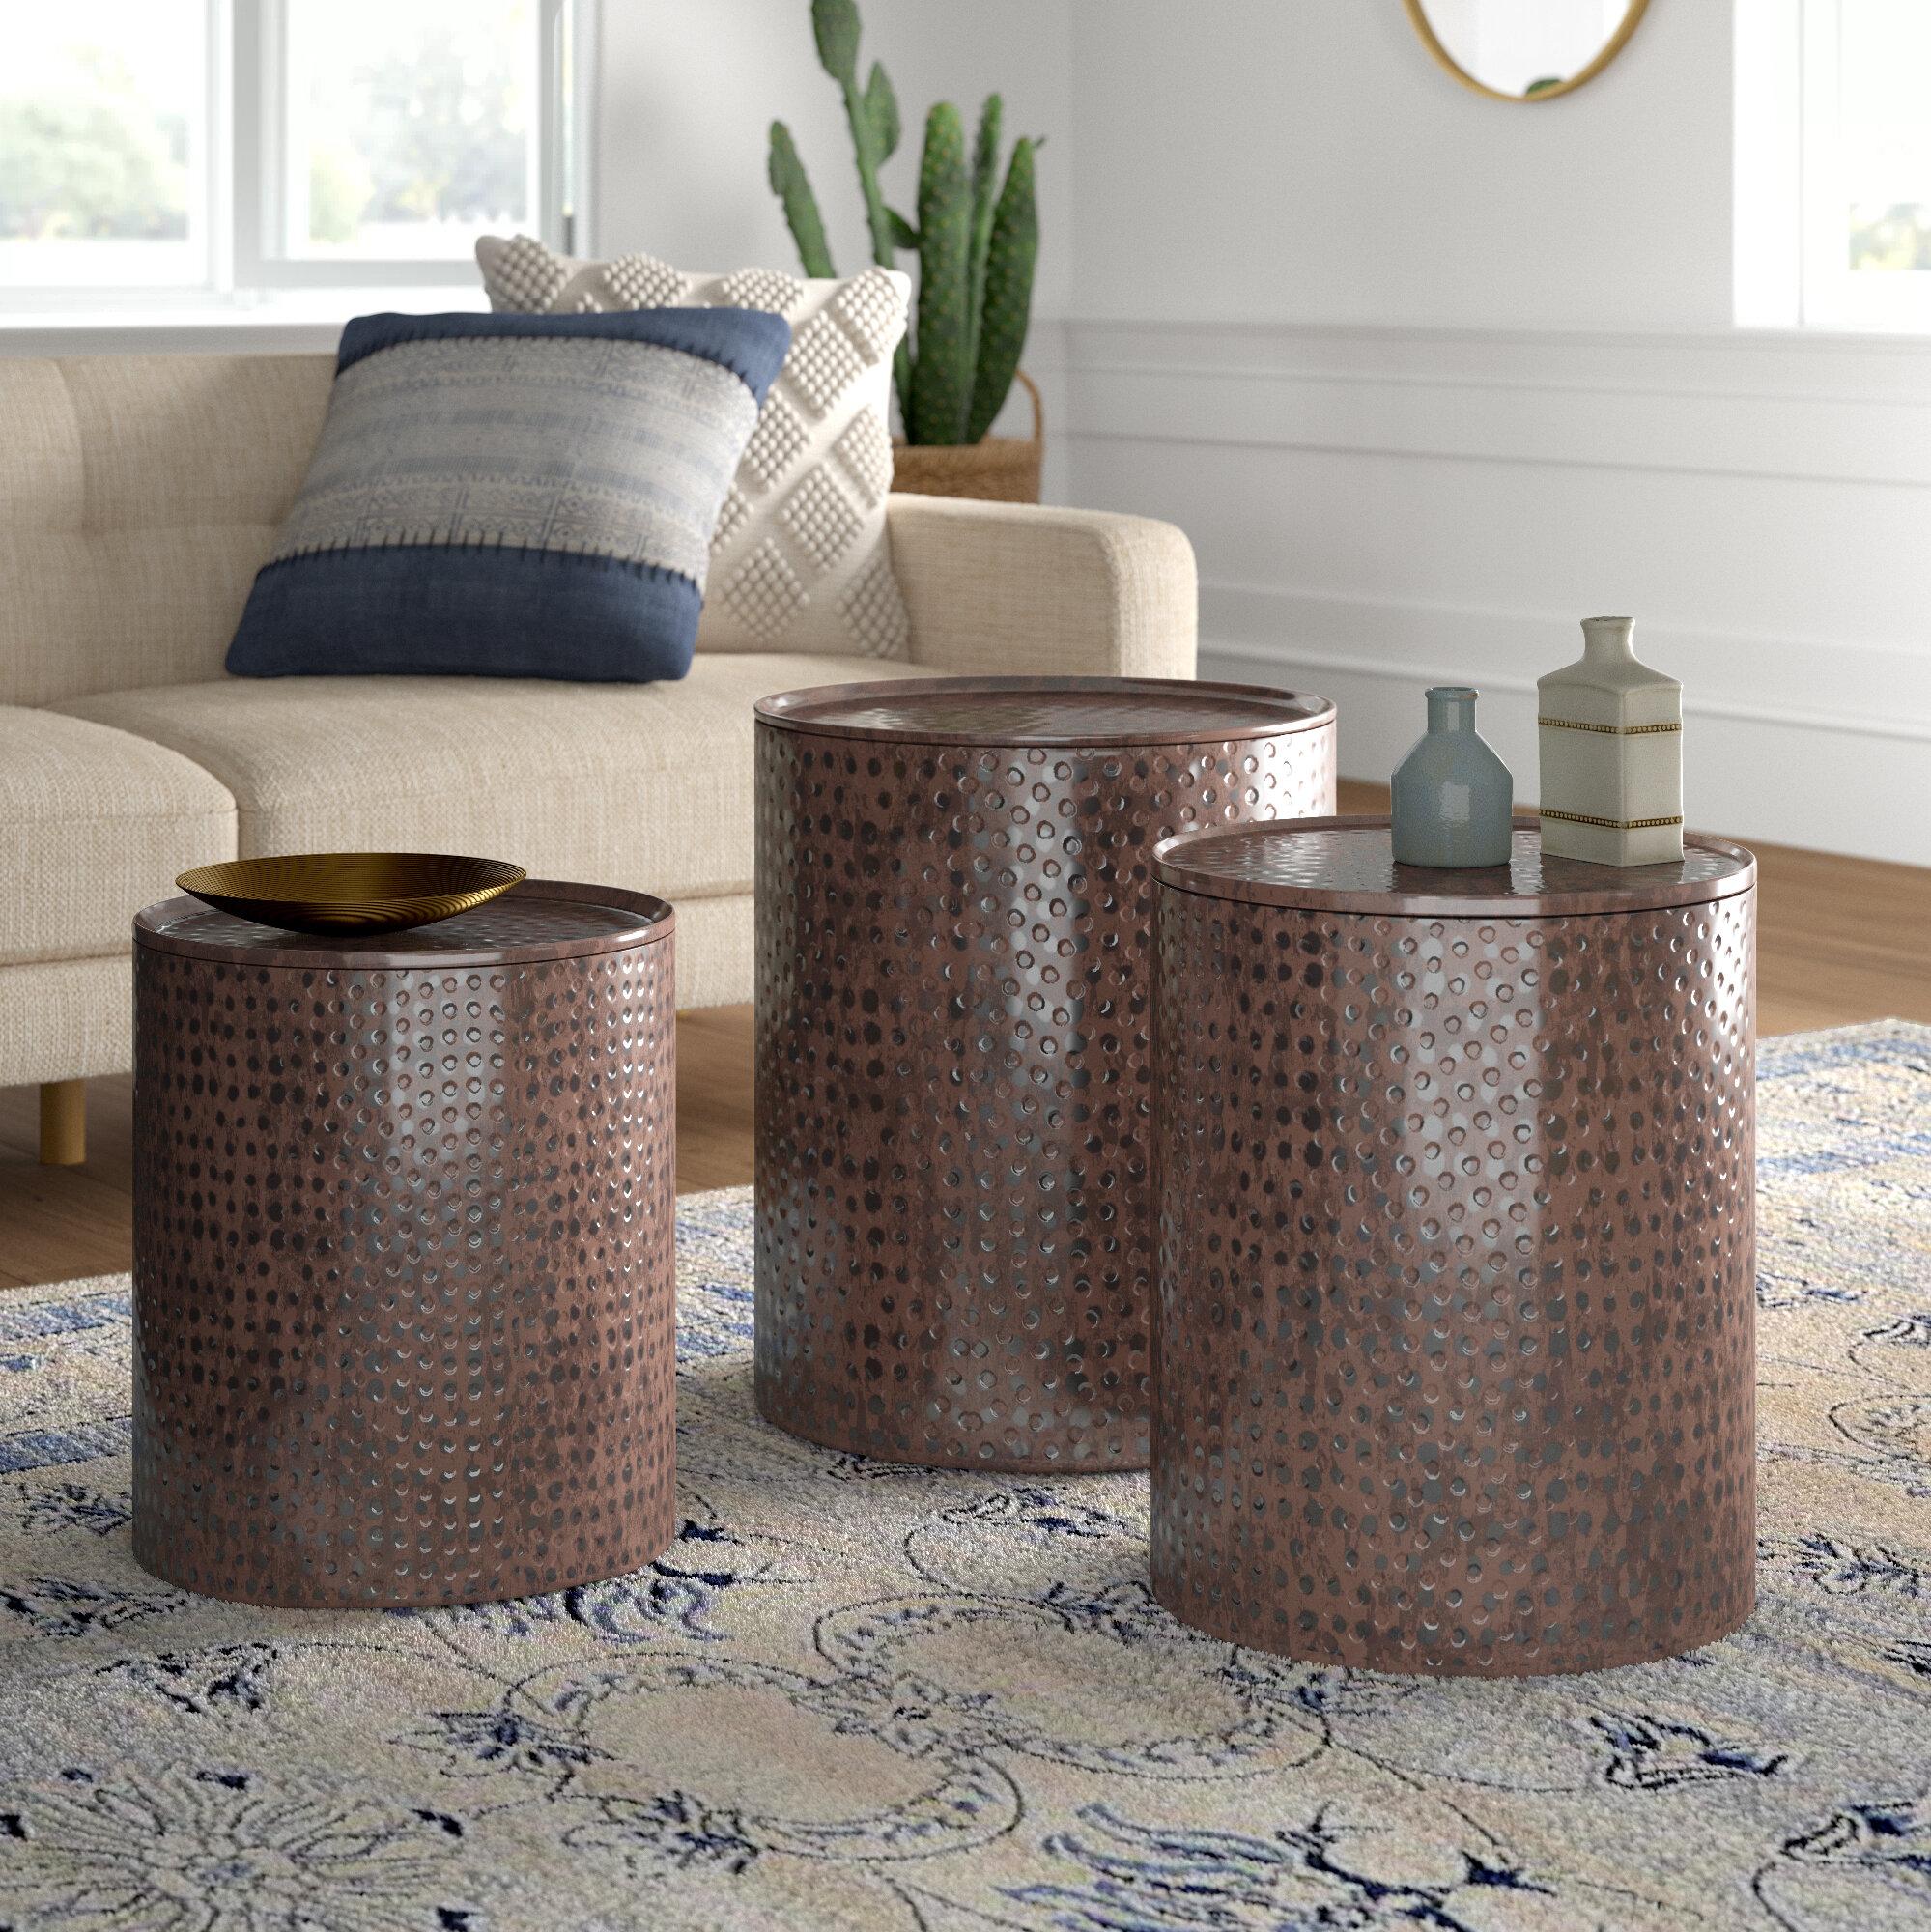 Incredible Mistana Adrianna 3 Piece Coffee Table Set Reviews Wayfair Bralicious Painted Fabric Chair Ideas Braliciousco